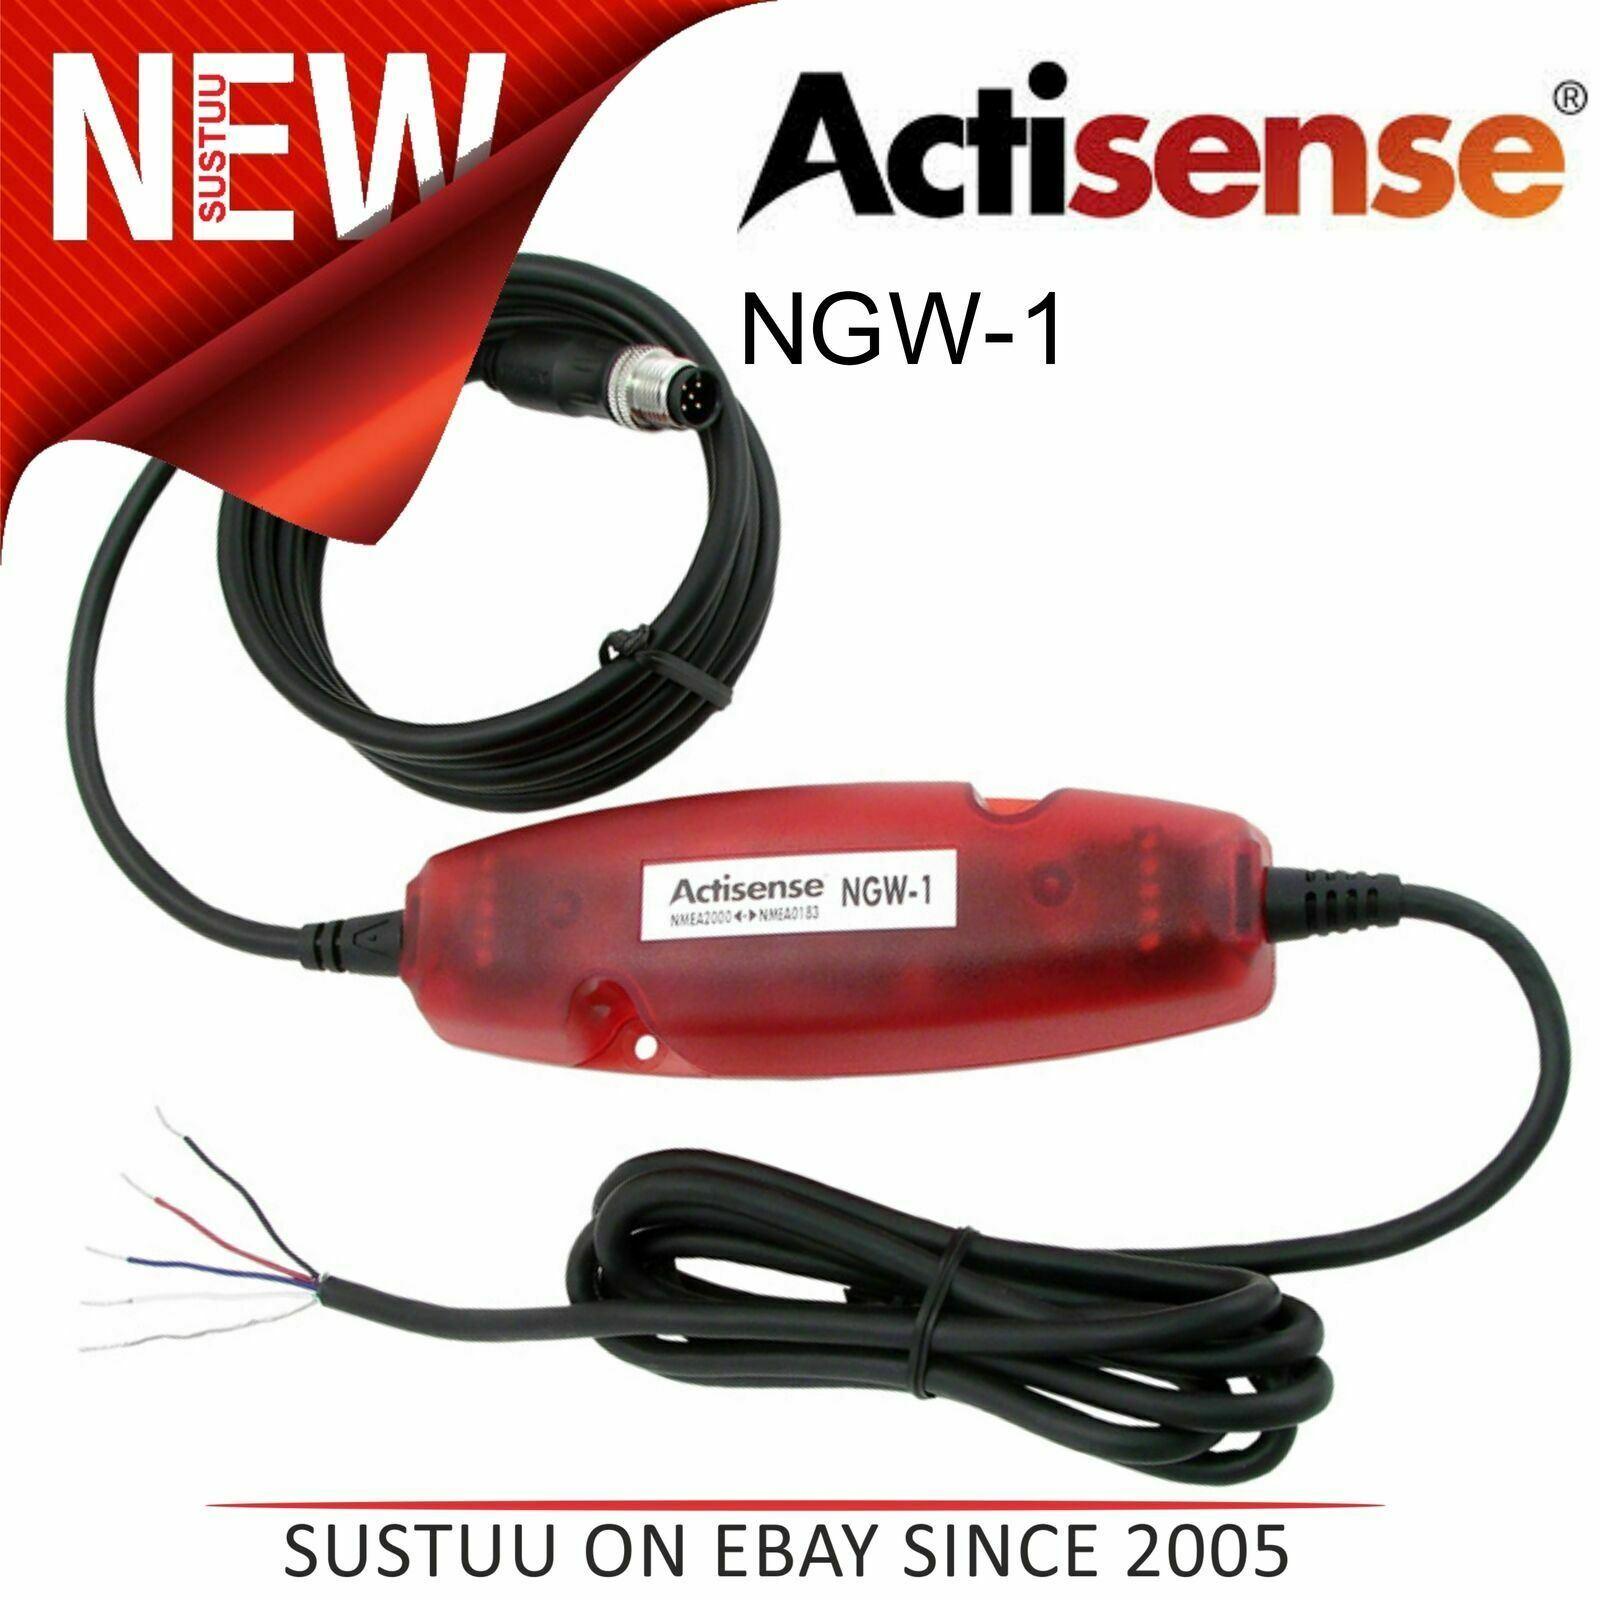 Actisense NGT-1-USB Puerta de Enlace USB para Redes NMEA